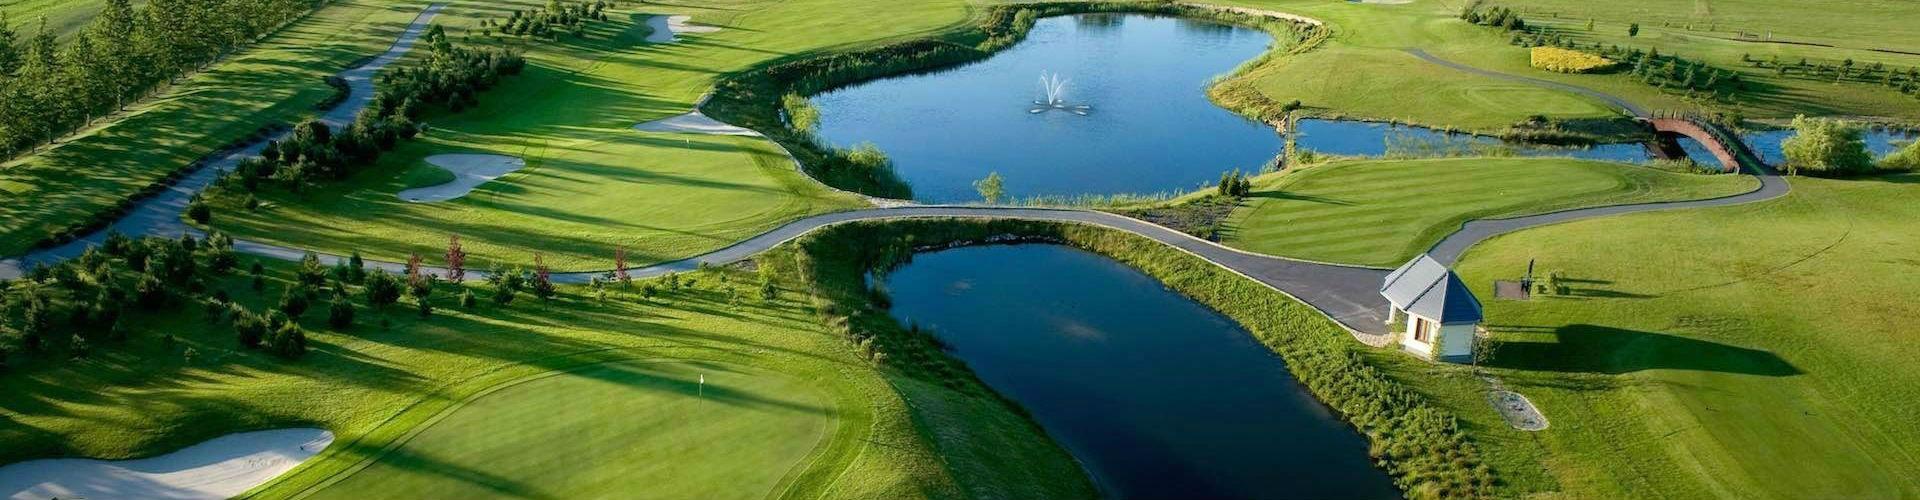 Golfresor Polen - golfreseguiden.se